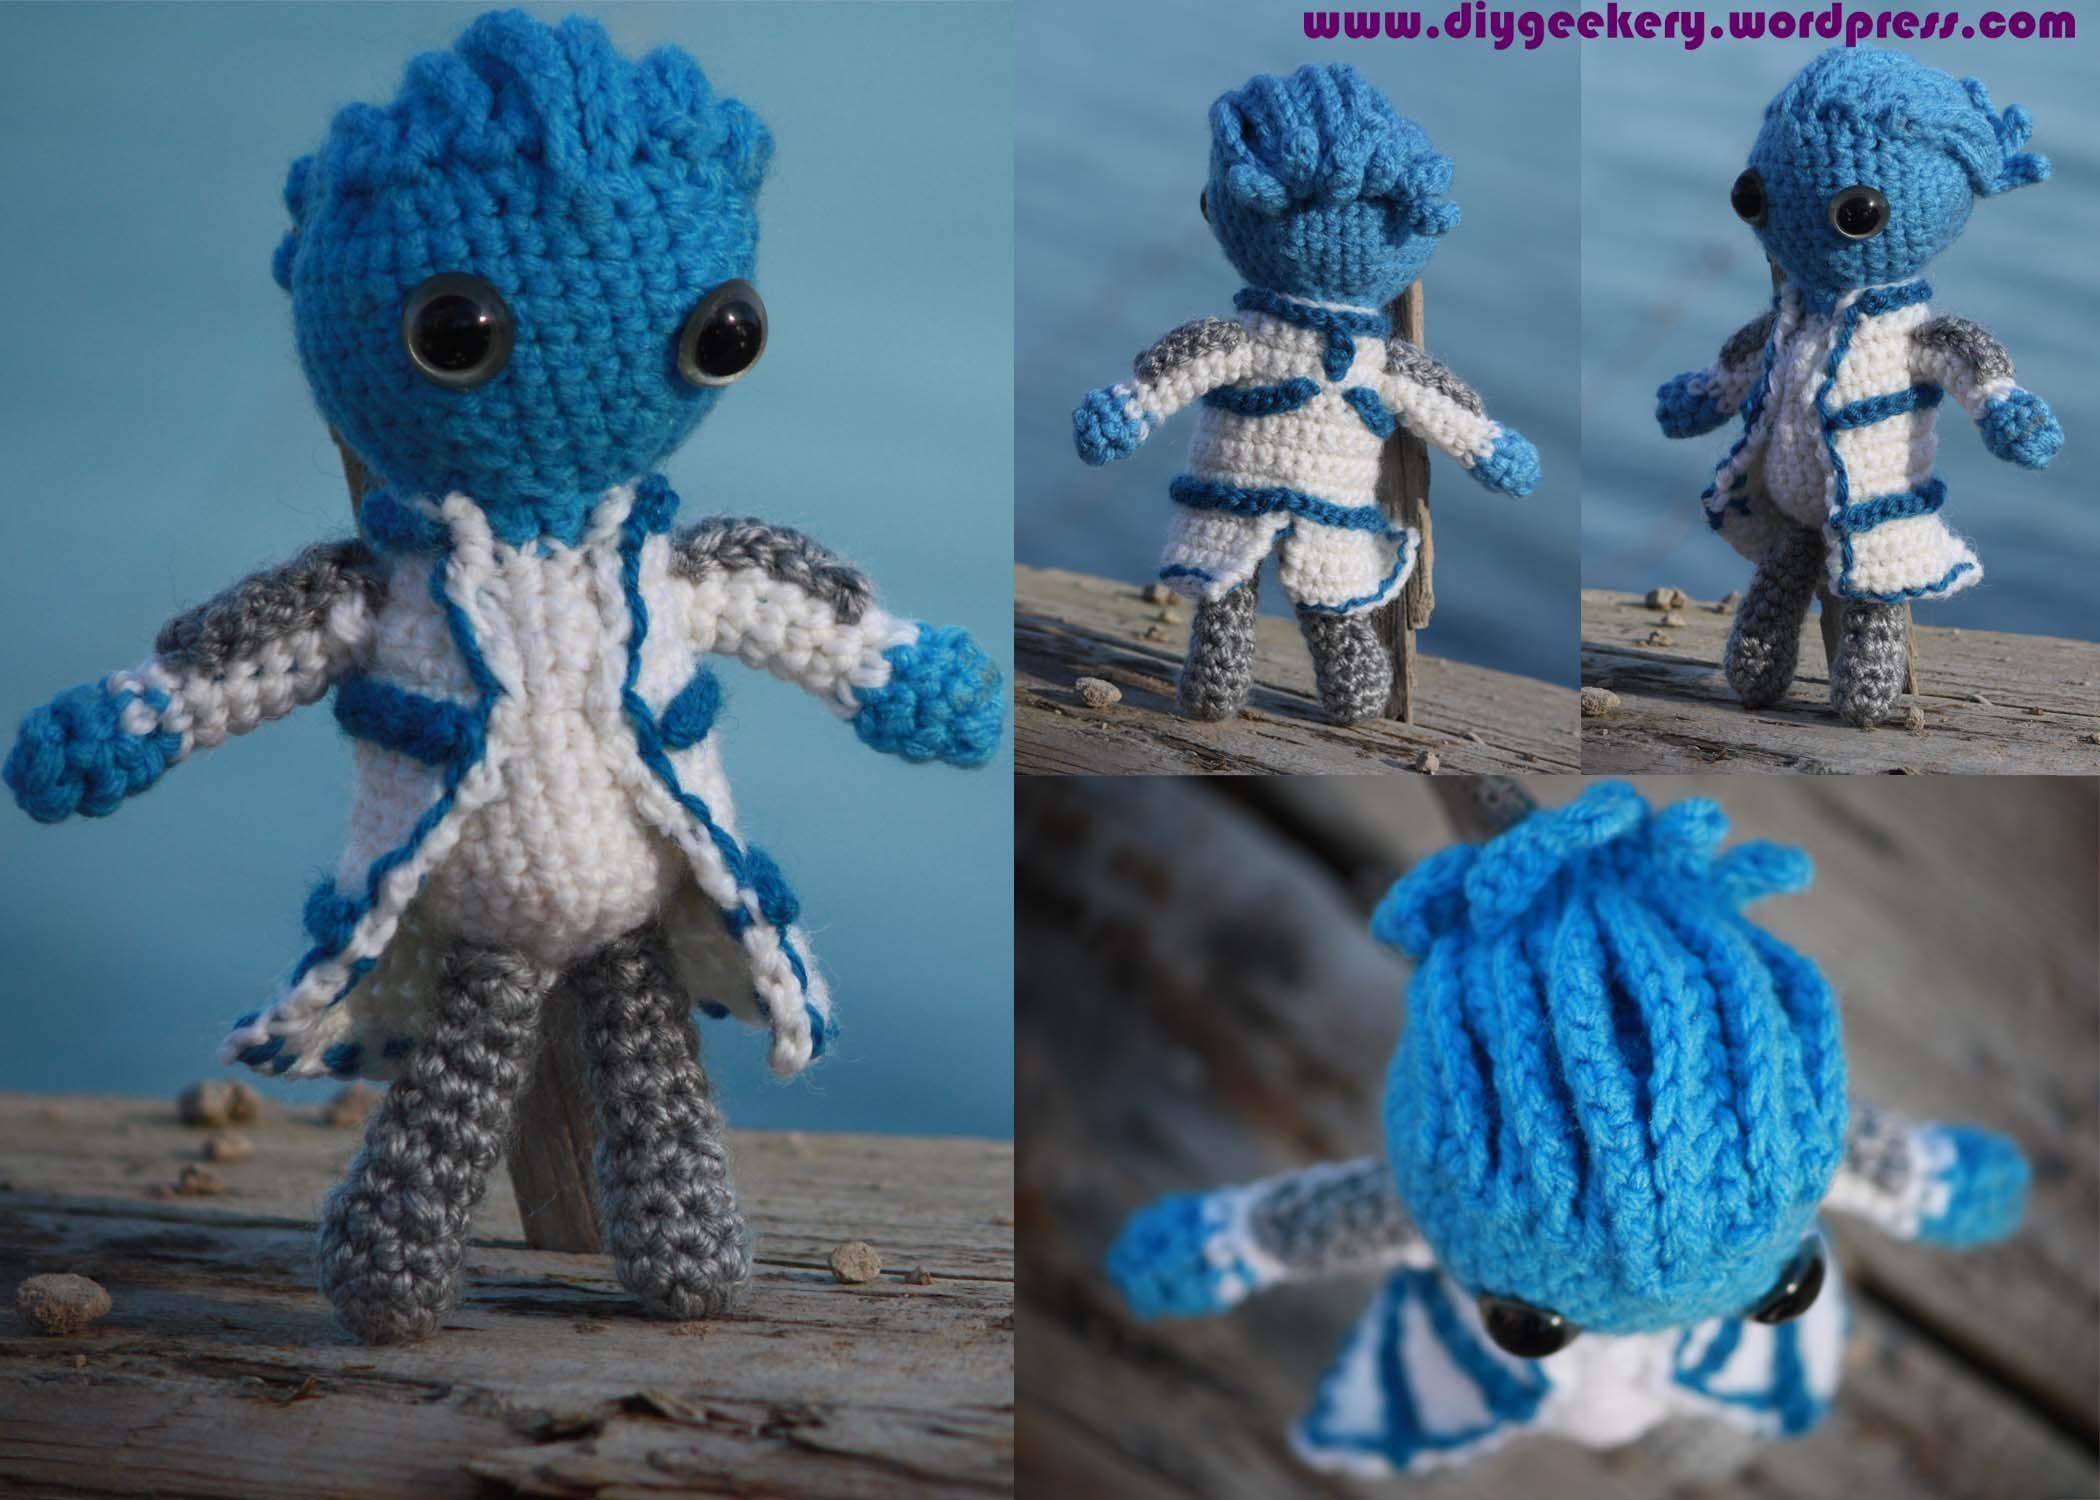 Crochet Amigurumi Patterns : Mass effect liara amigurumi amigurumi patterns and craft